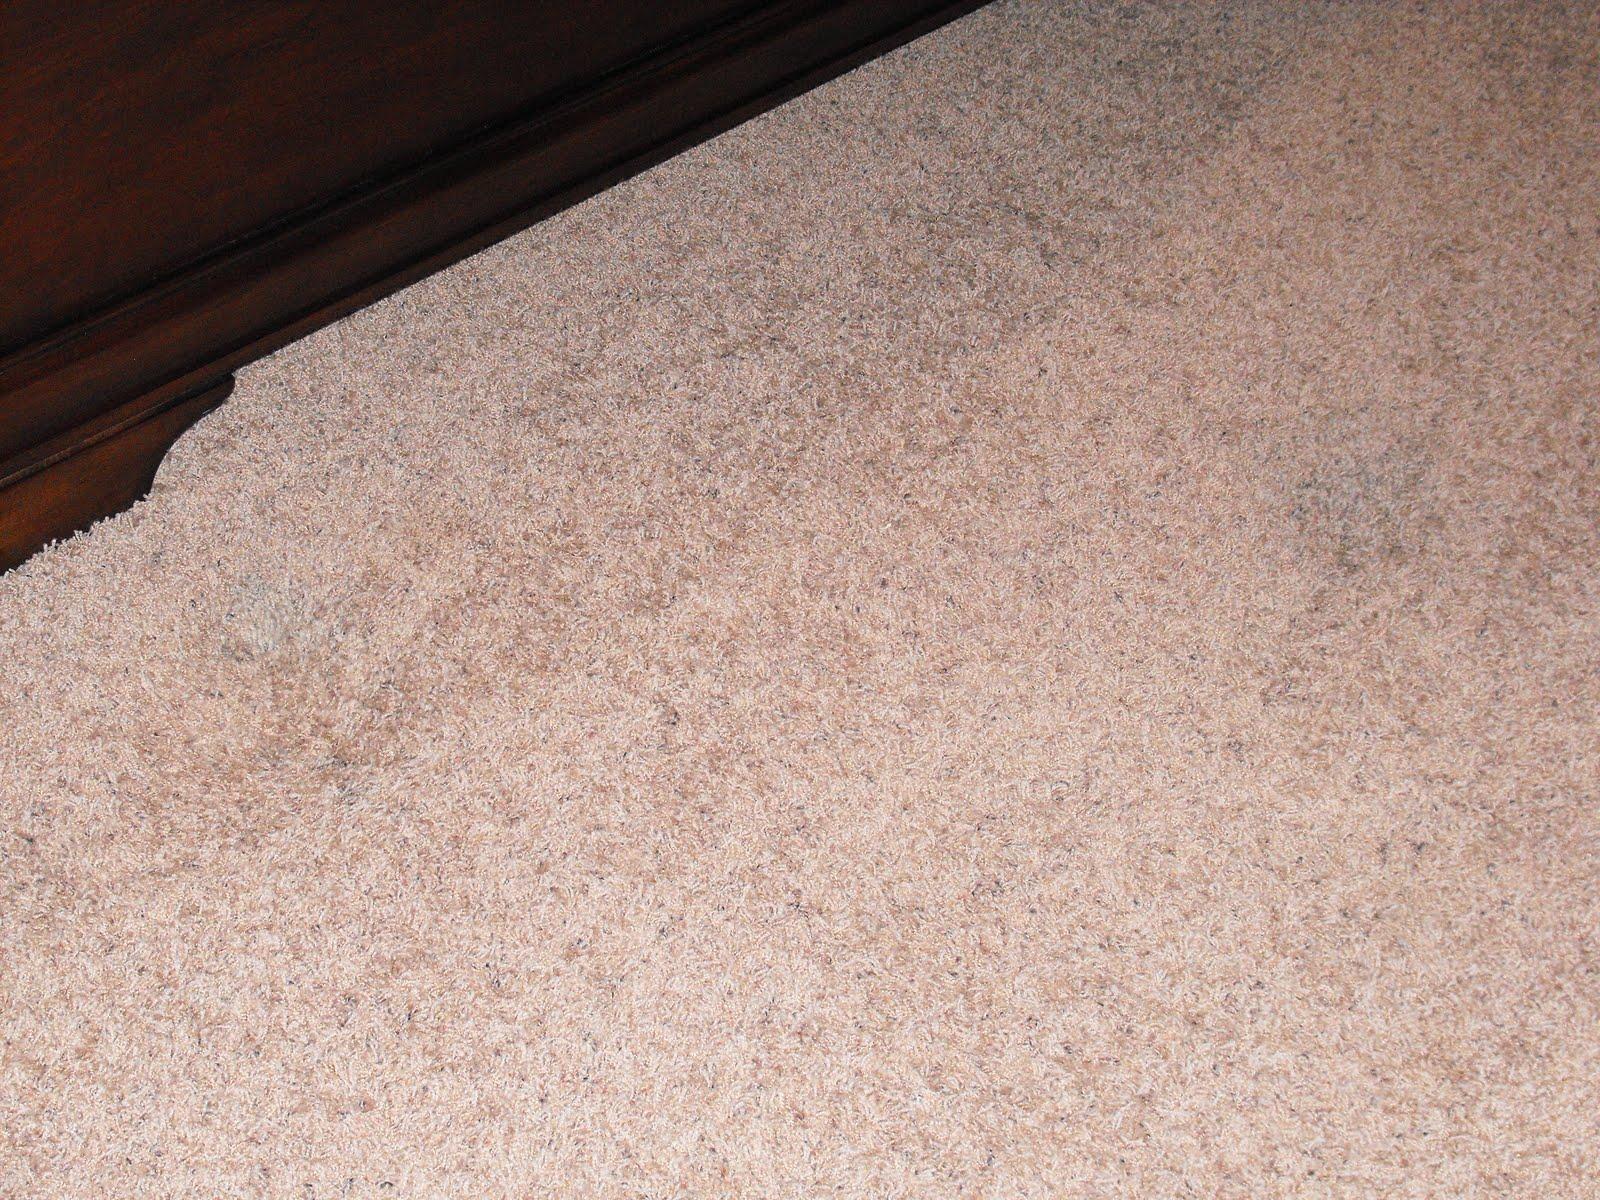 Hairspray To Get Ink Out Of Carpet Vidalondon